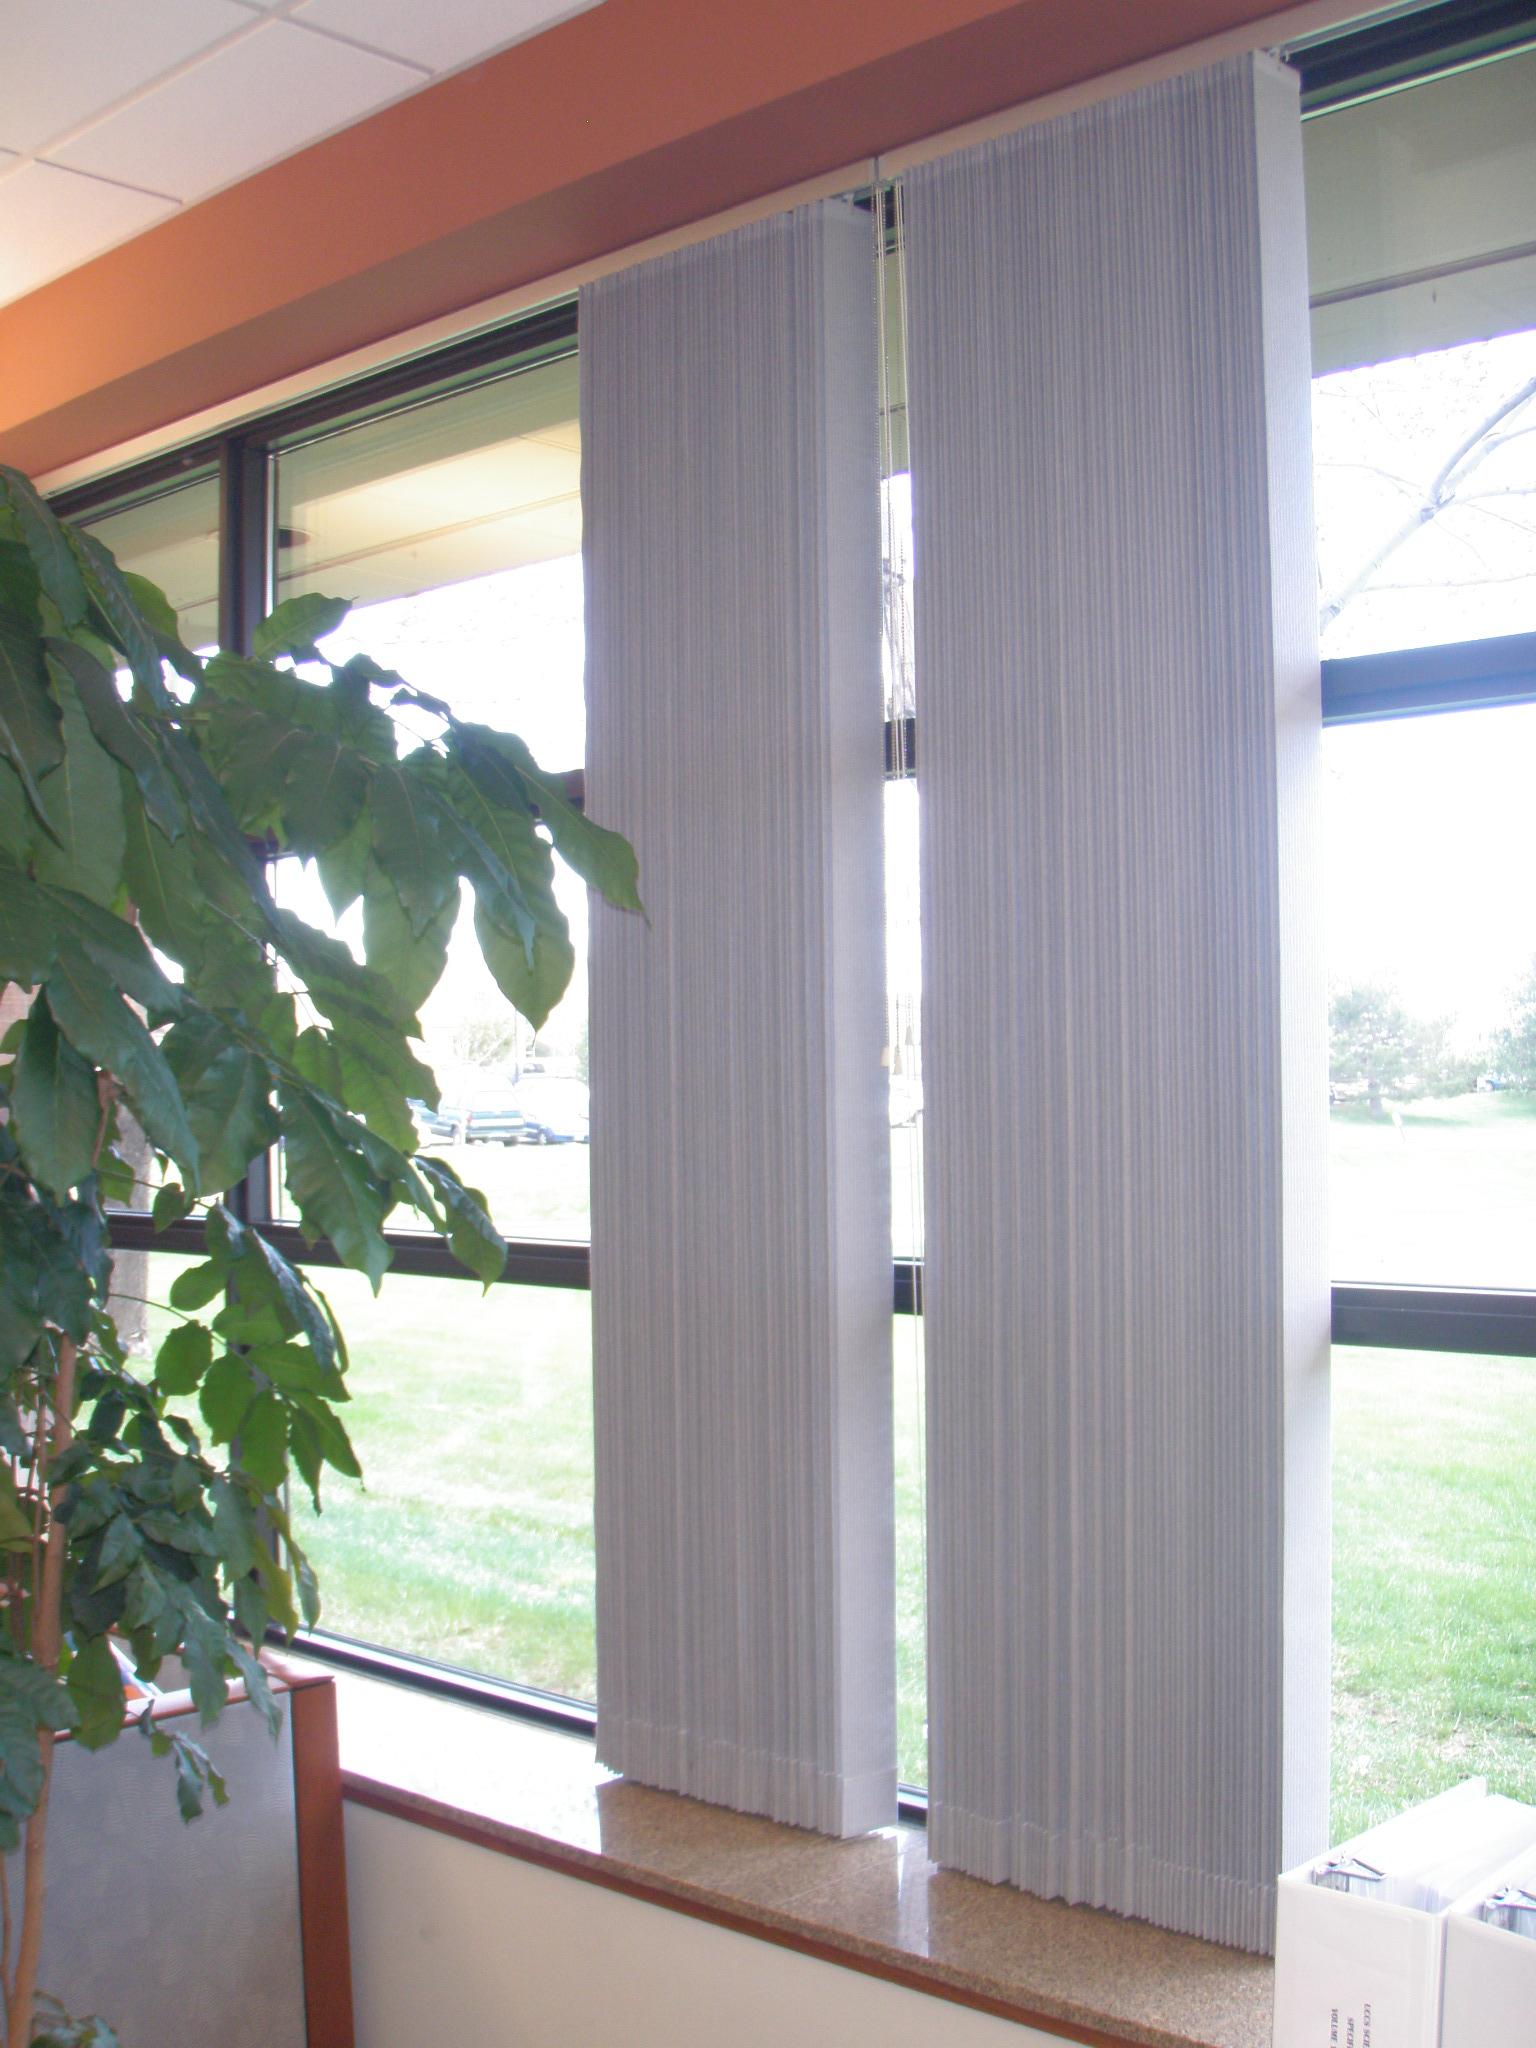 windows floor window london roller sunscreen sliding ceiling doors to pin blinds commercial